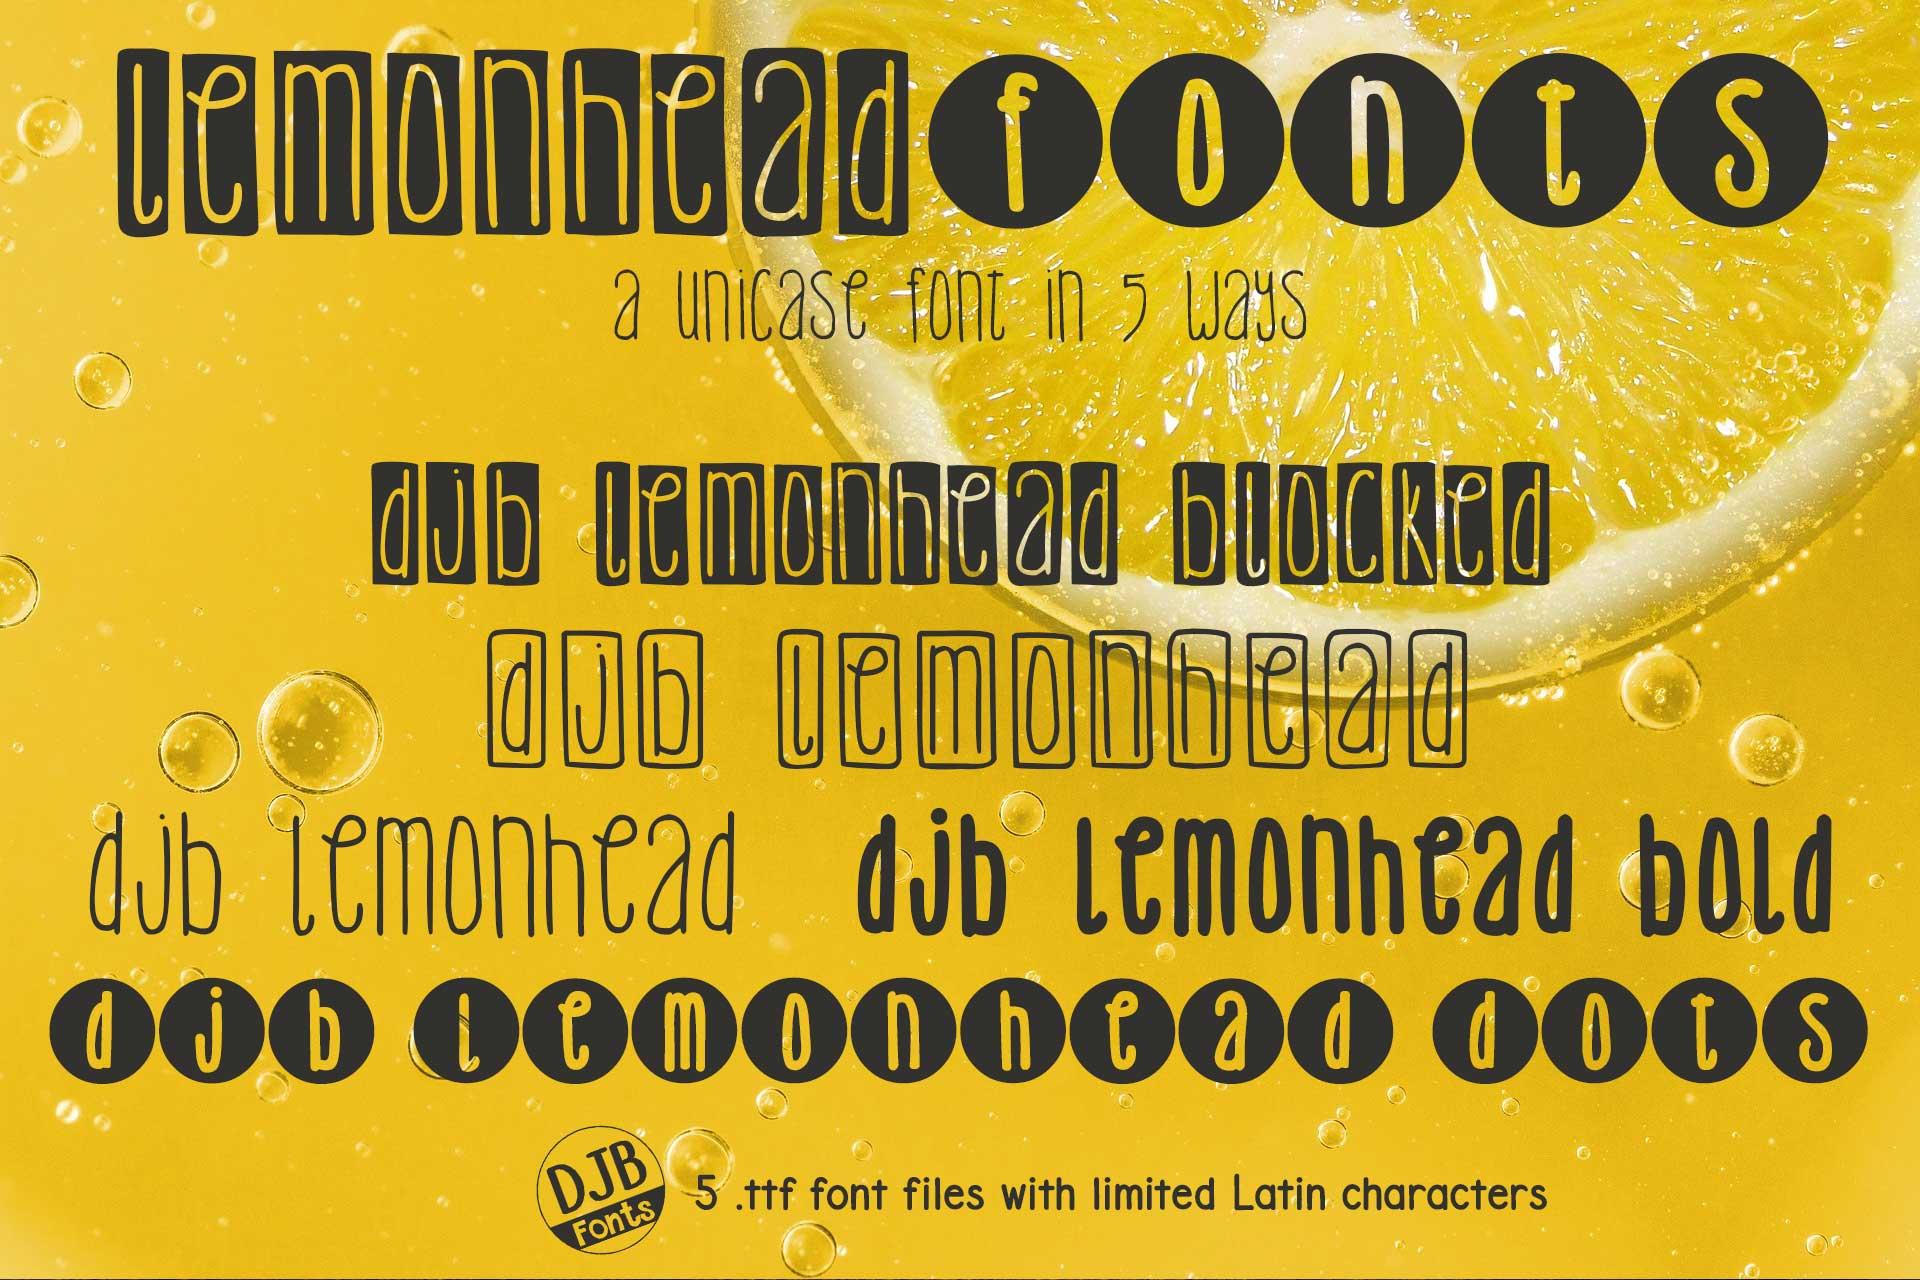 DJB Lemonhead Font Bundle example image 1